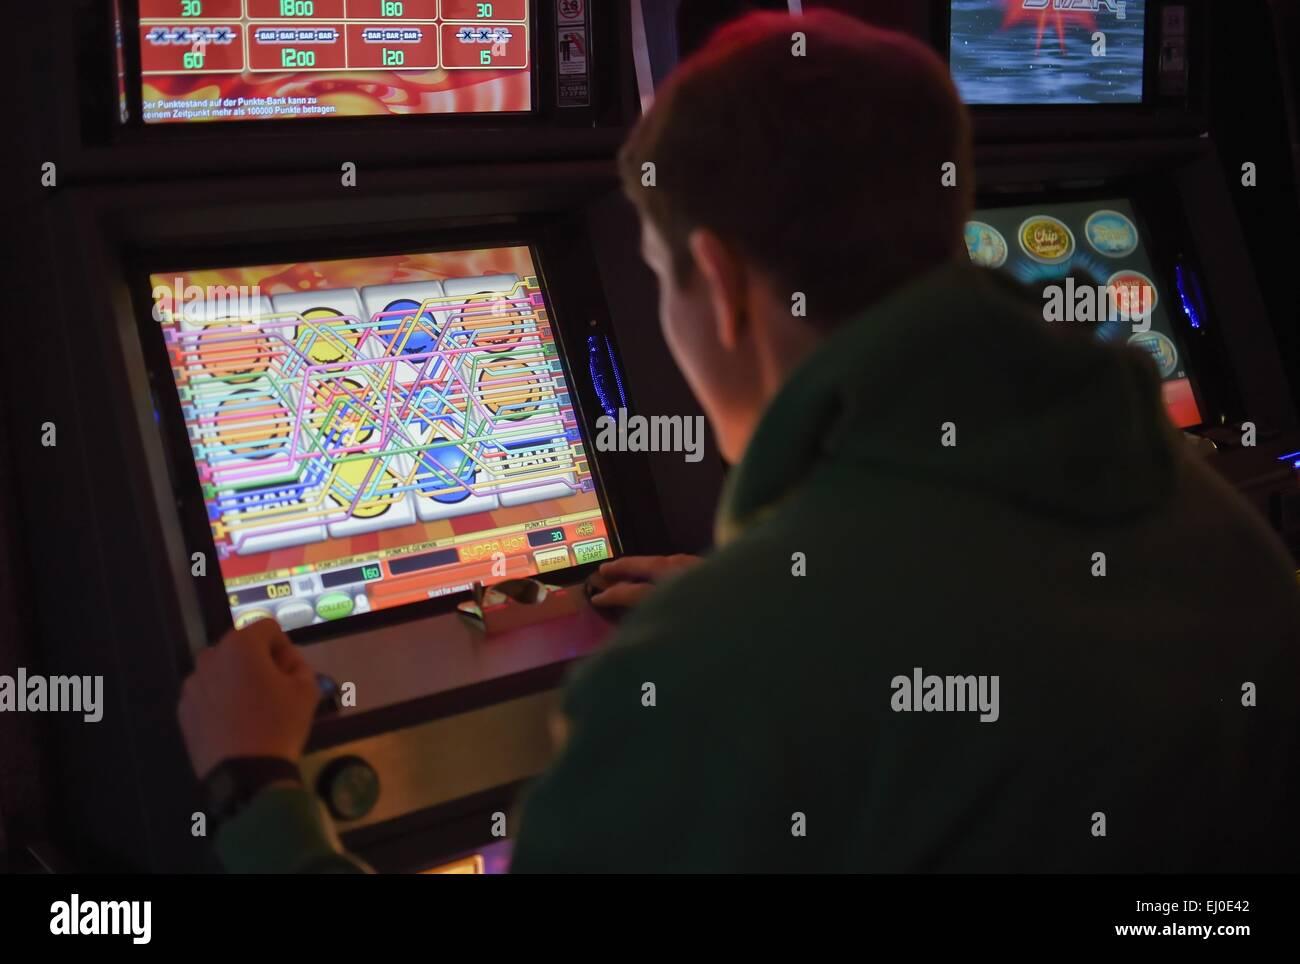 App slots glitch